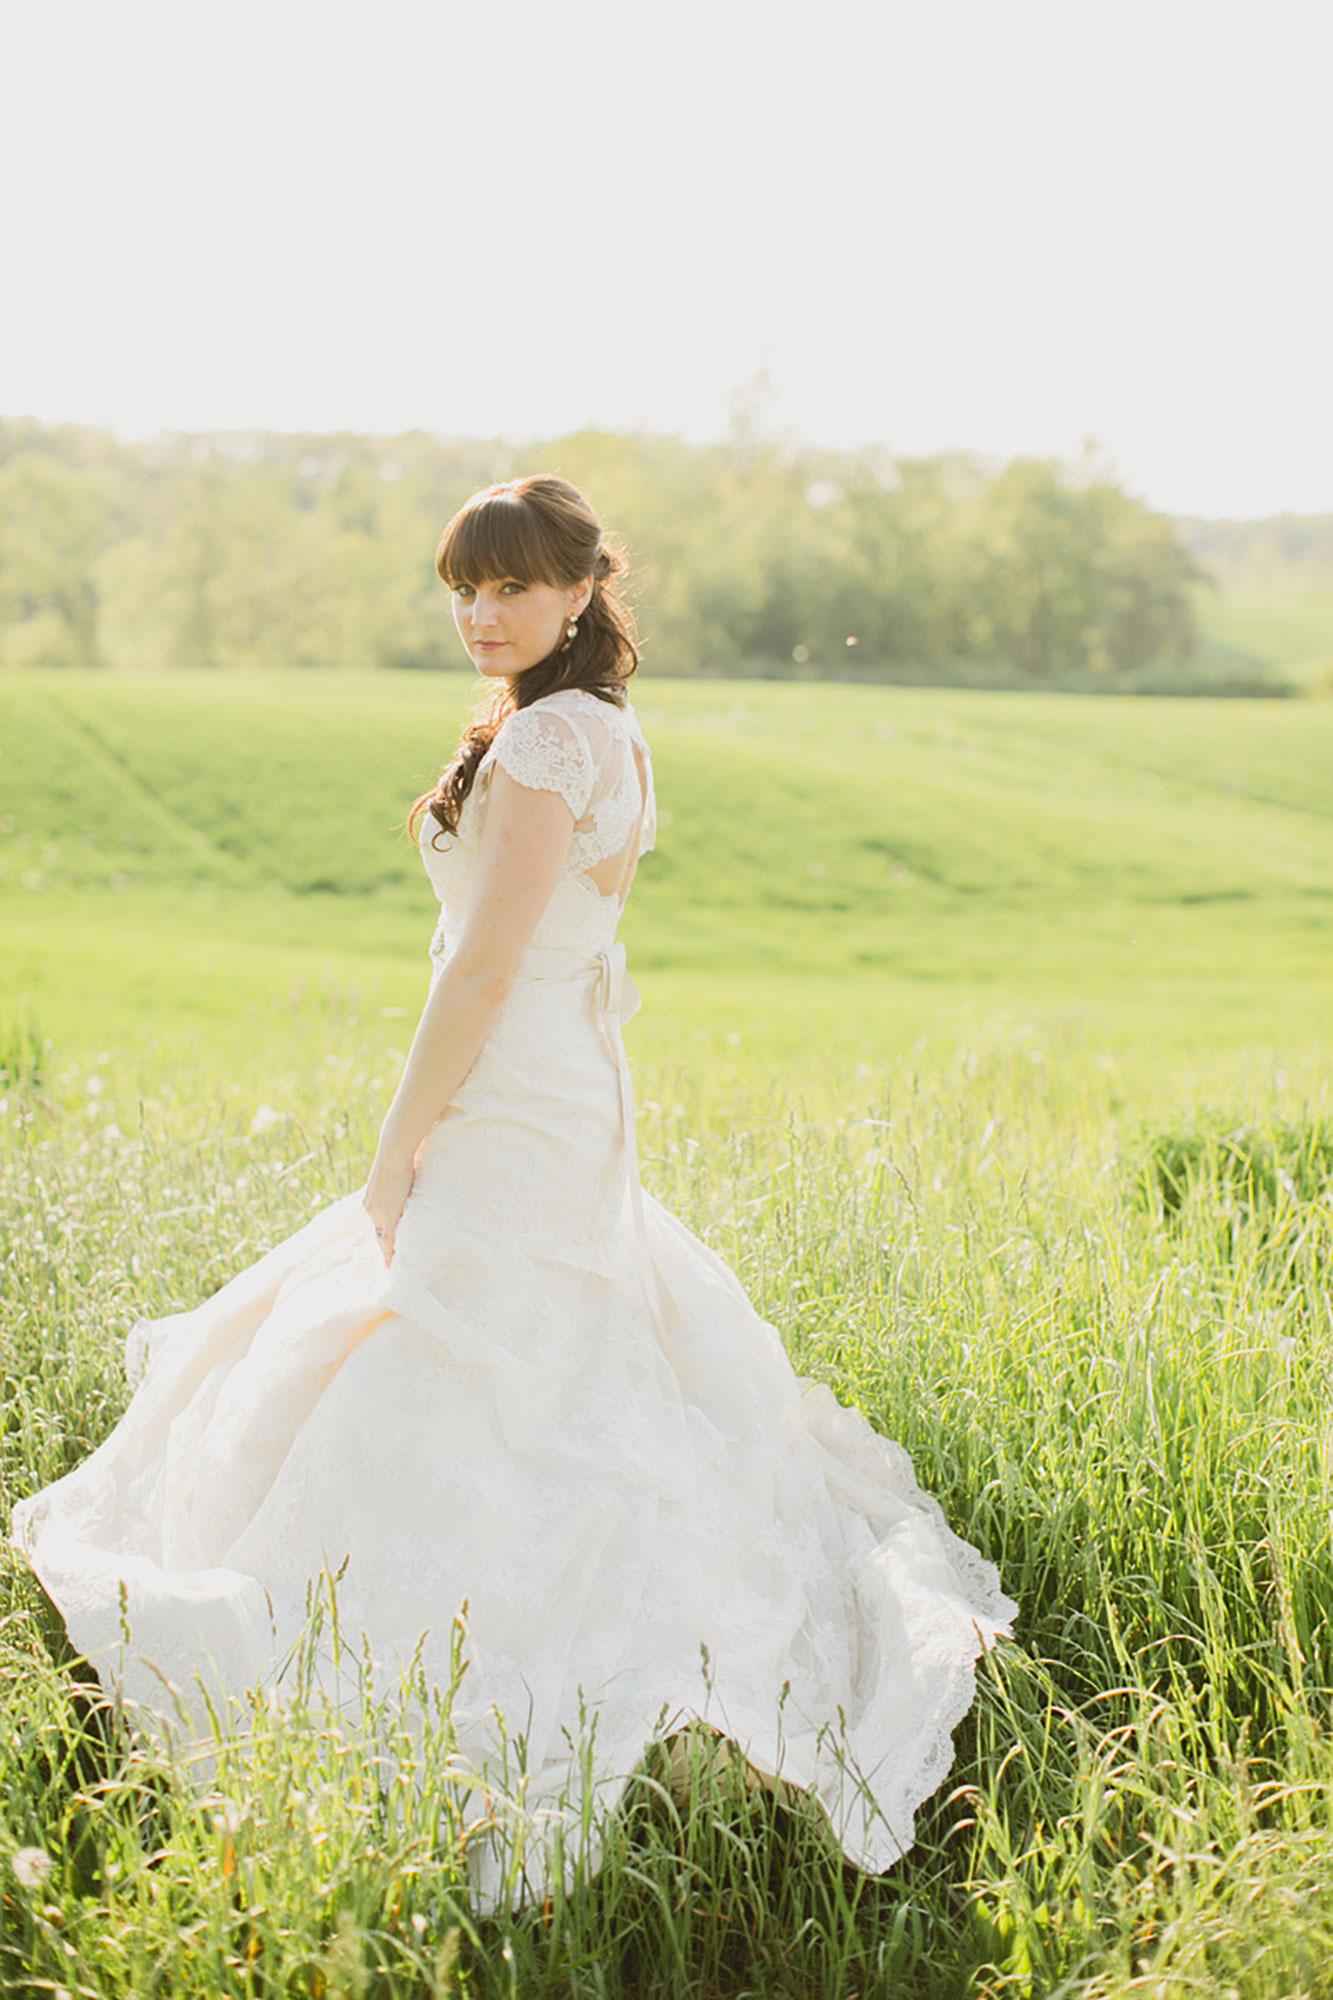 Balls-Falls-Vineyard-Bride-Photo-By-Elizabeth-in-Love-023.jpg